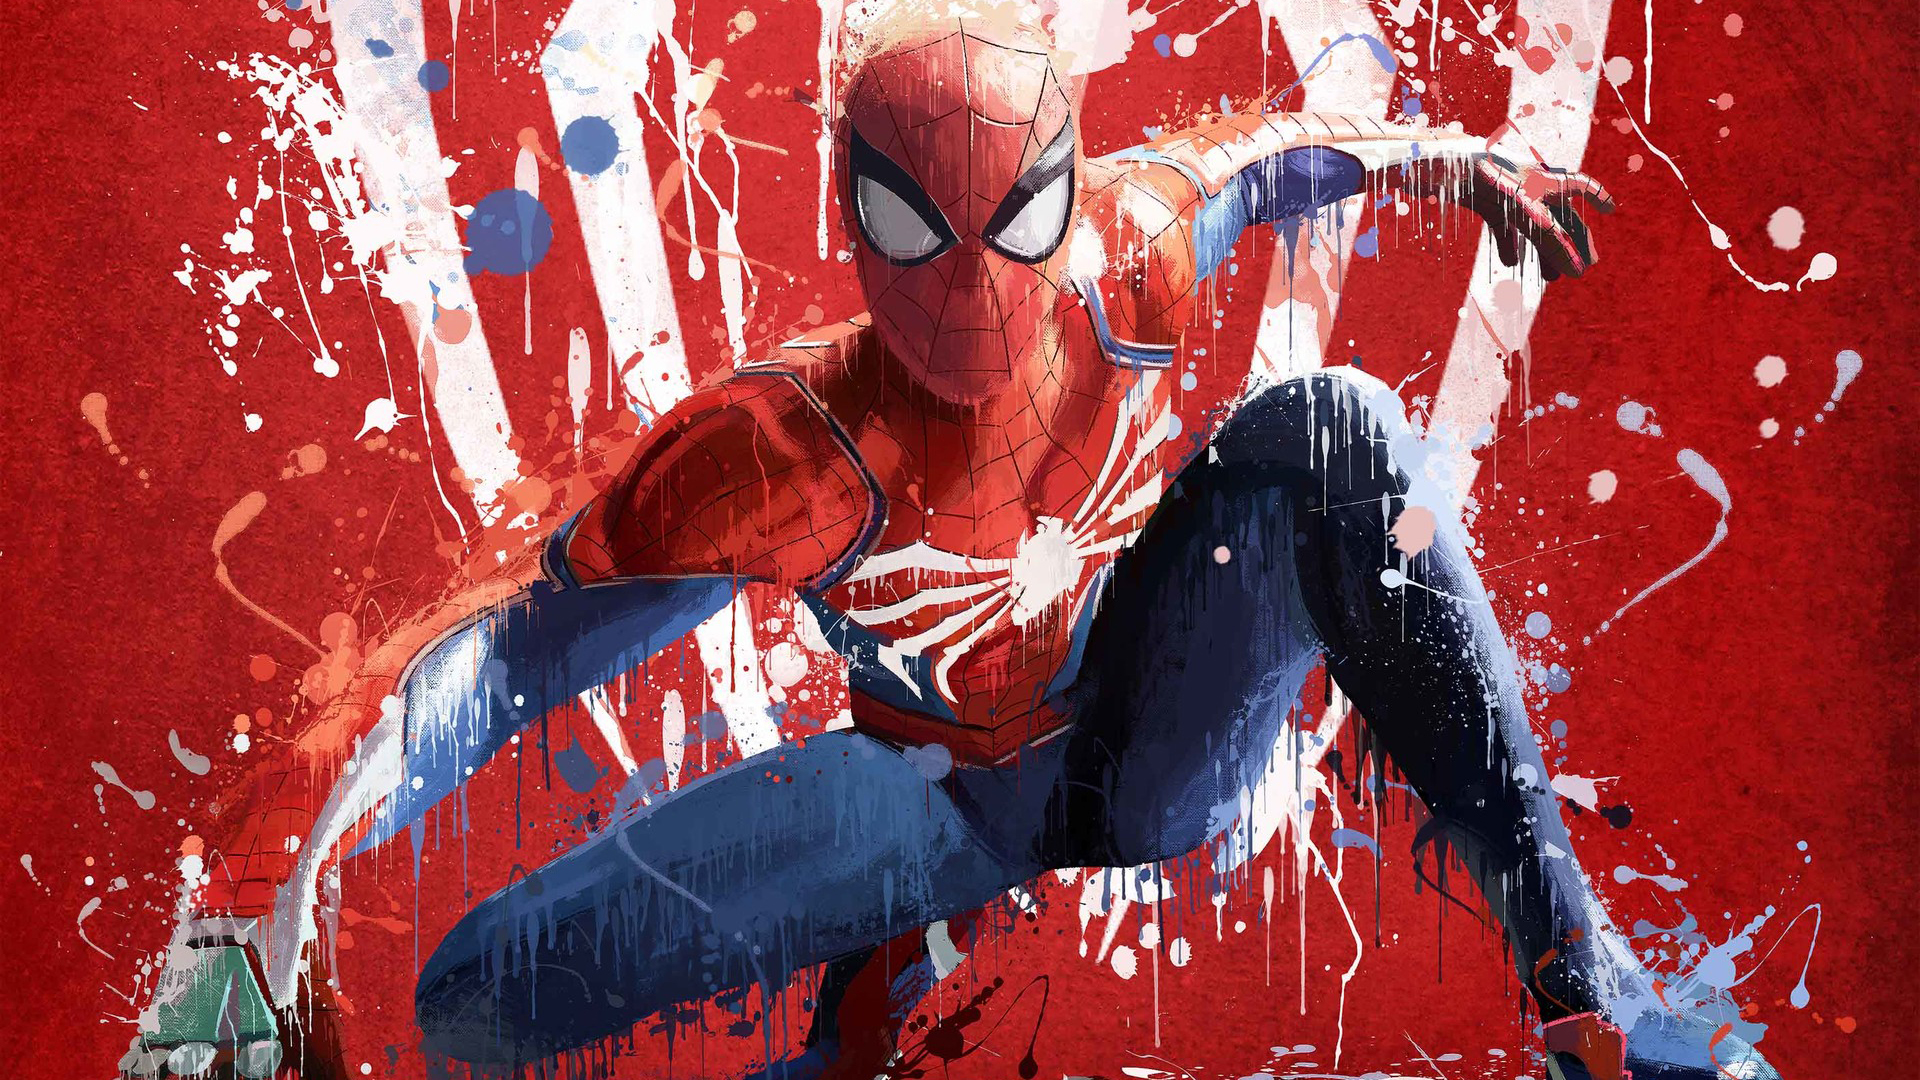 Spider Man Ps4 Fondo De Pantalla Hd Fondo De Escritorio